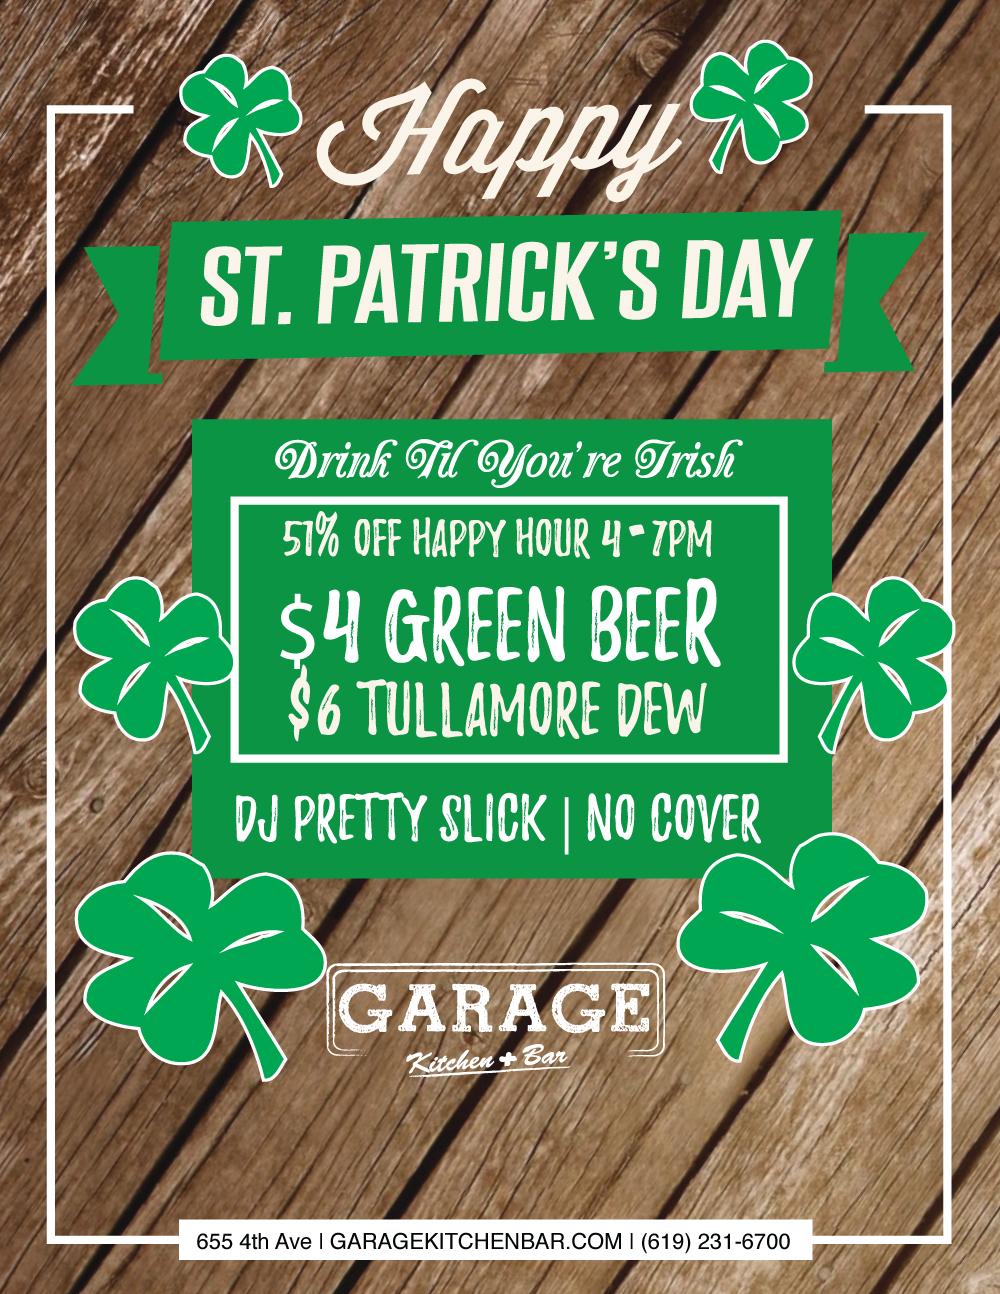 downtown san diego gaslamp quarter saint patricks day garage kitchen and bar